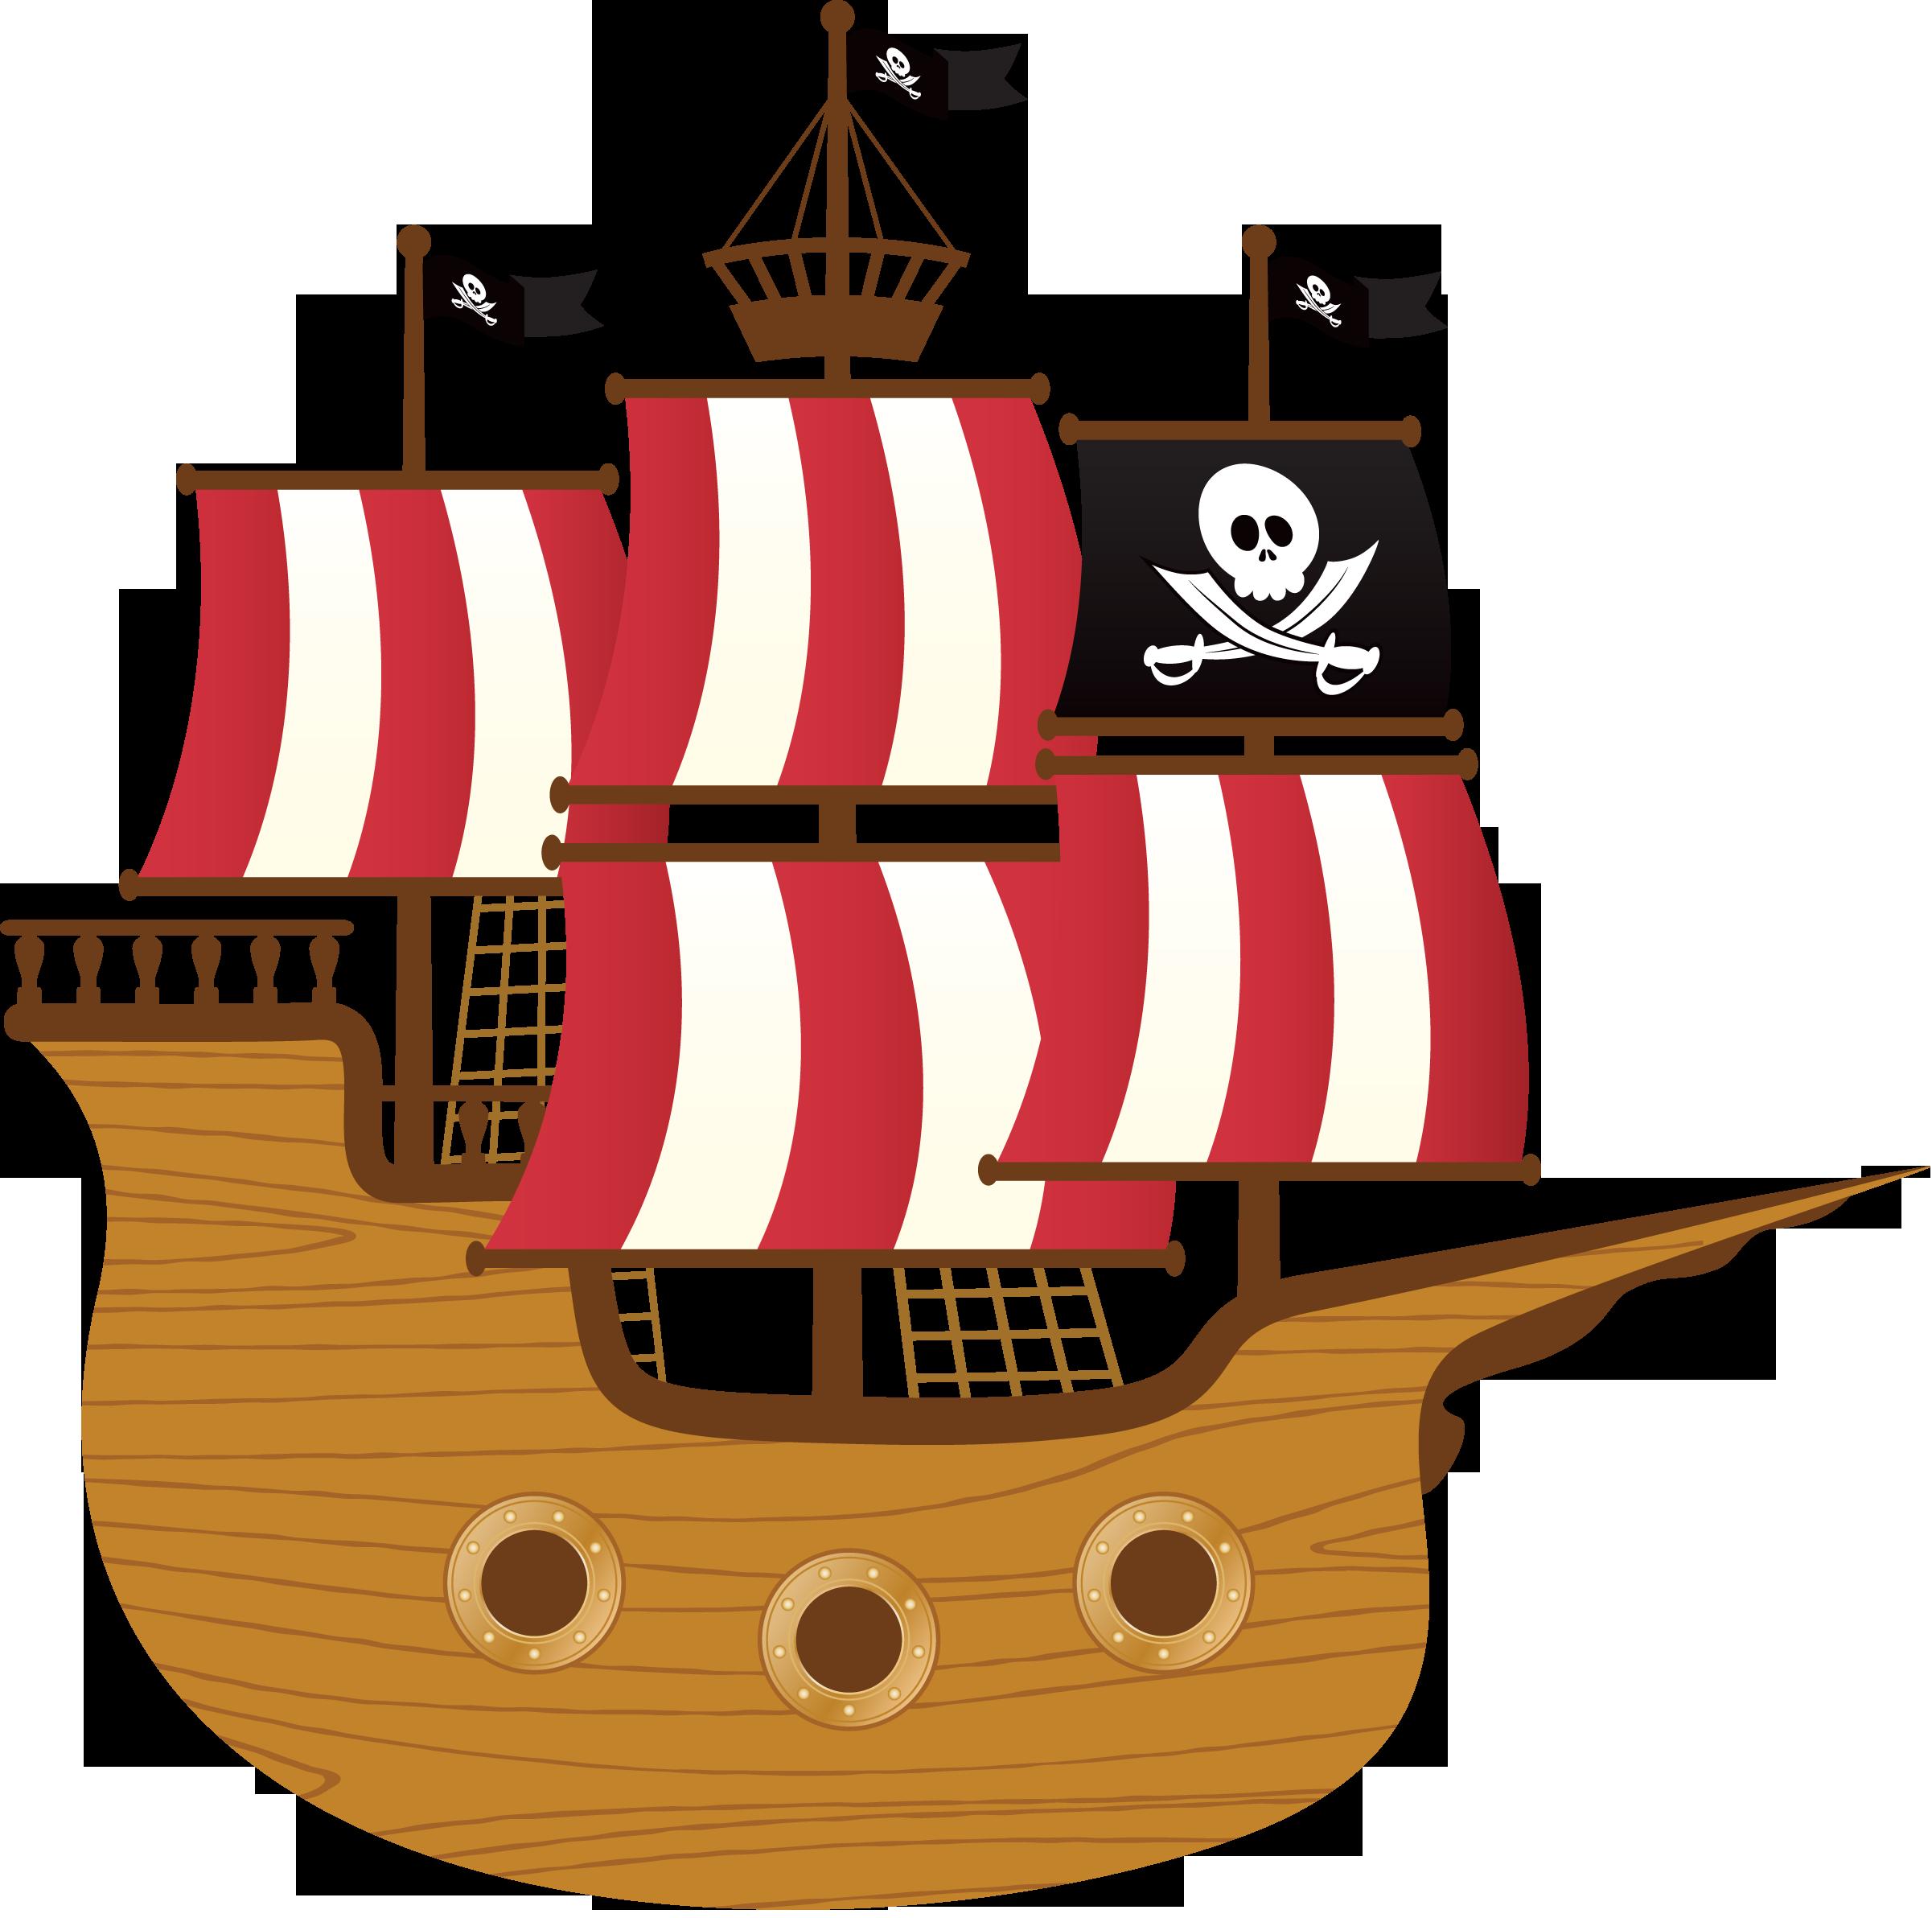 Cog ship clipart #4